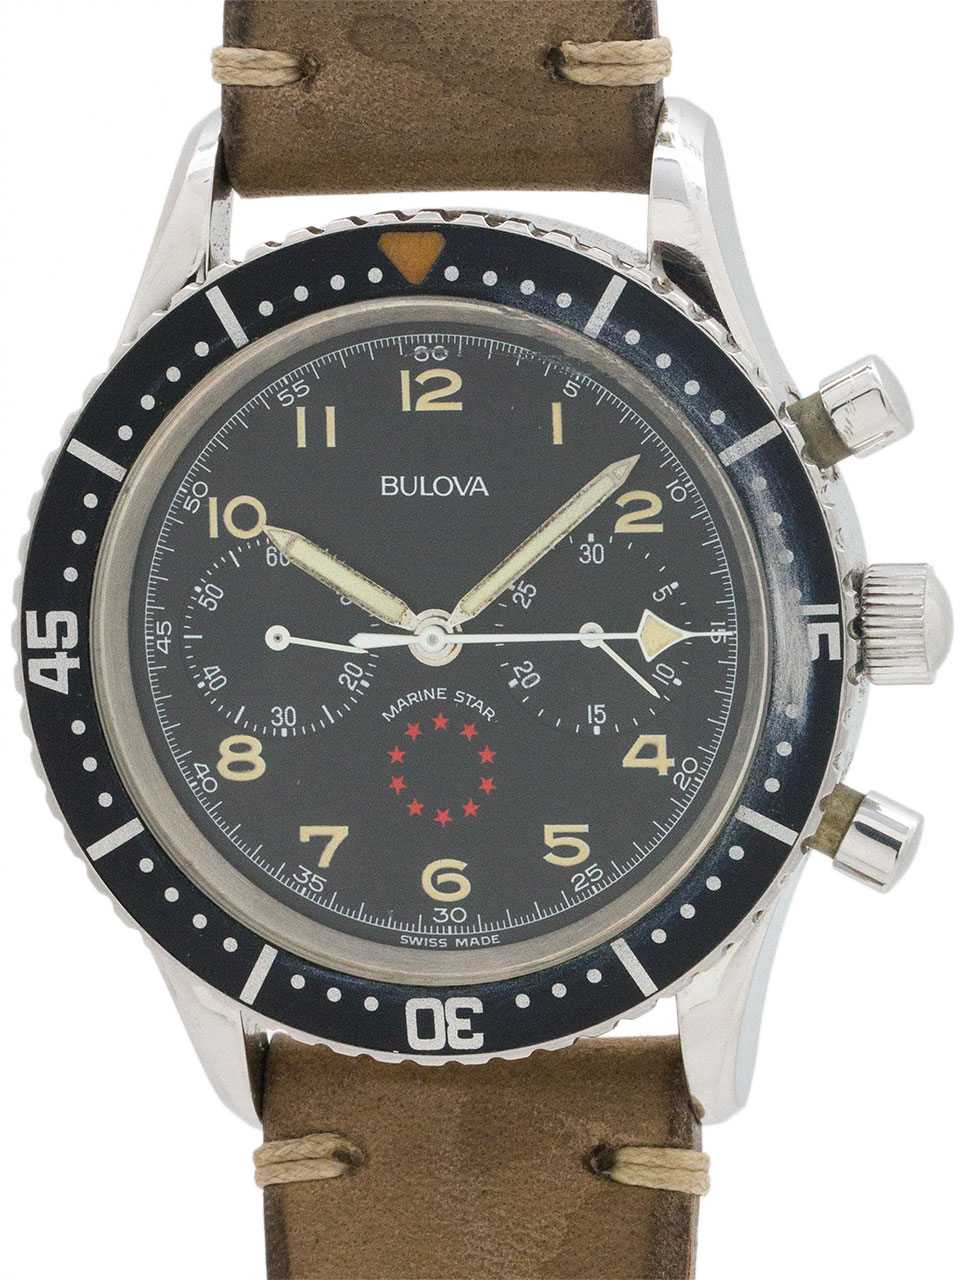 Bulova Marine Star Aviator Chronograph circa 1970